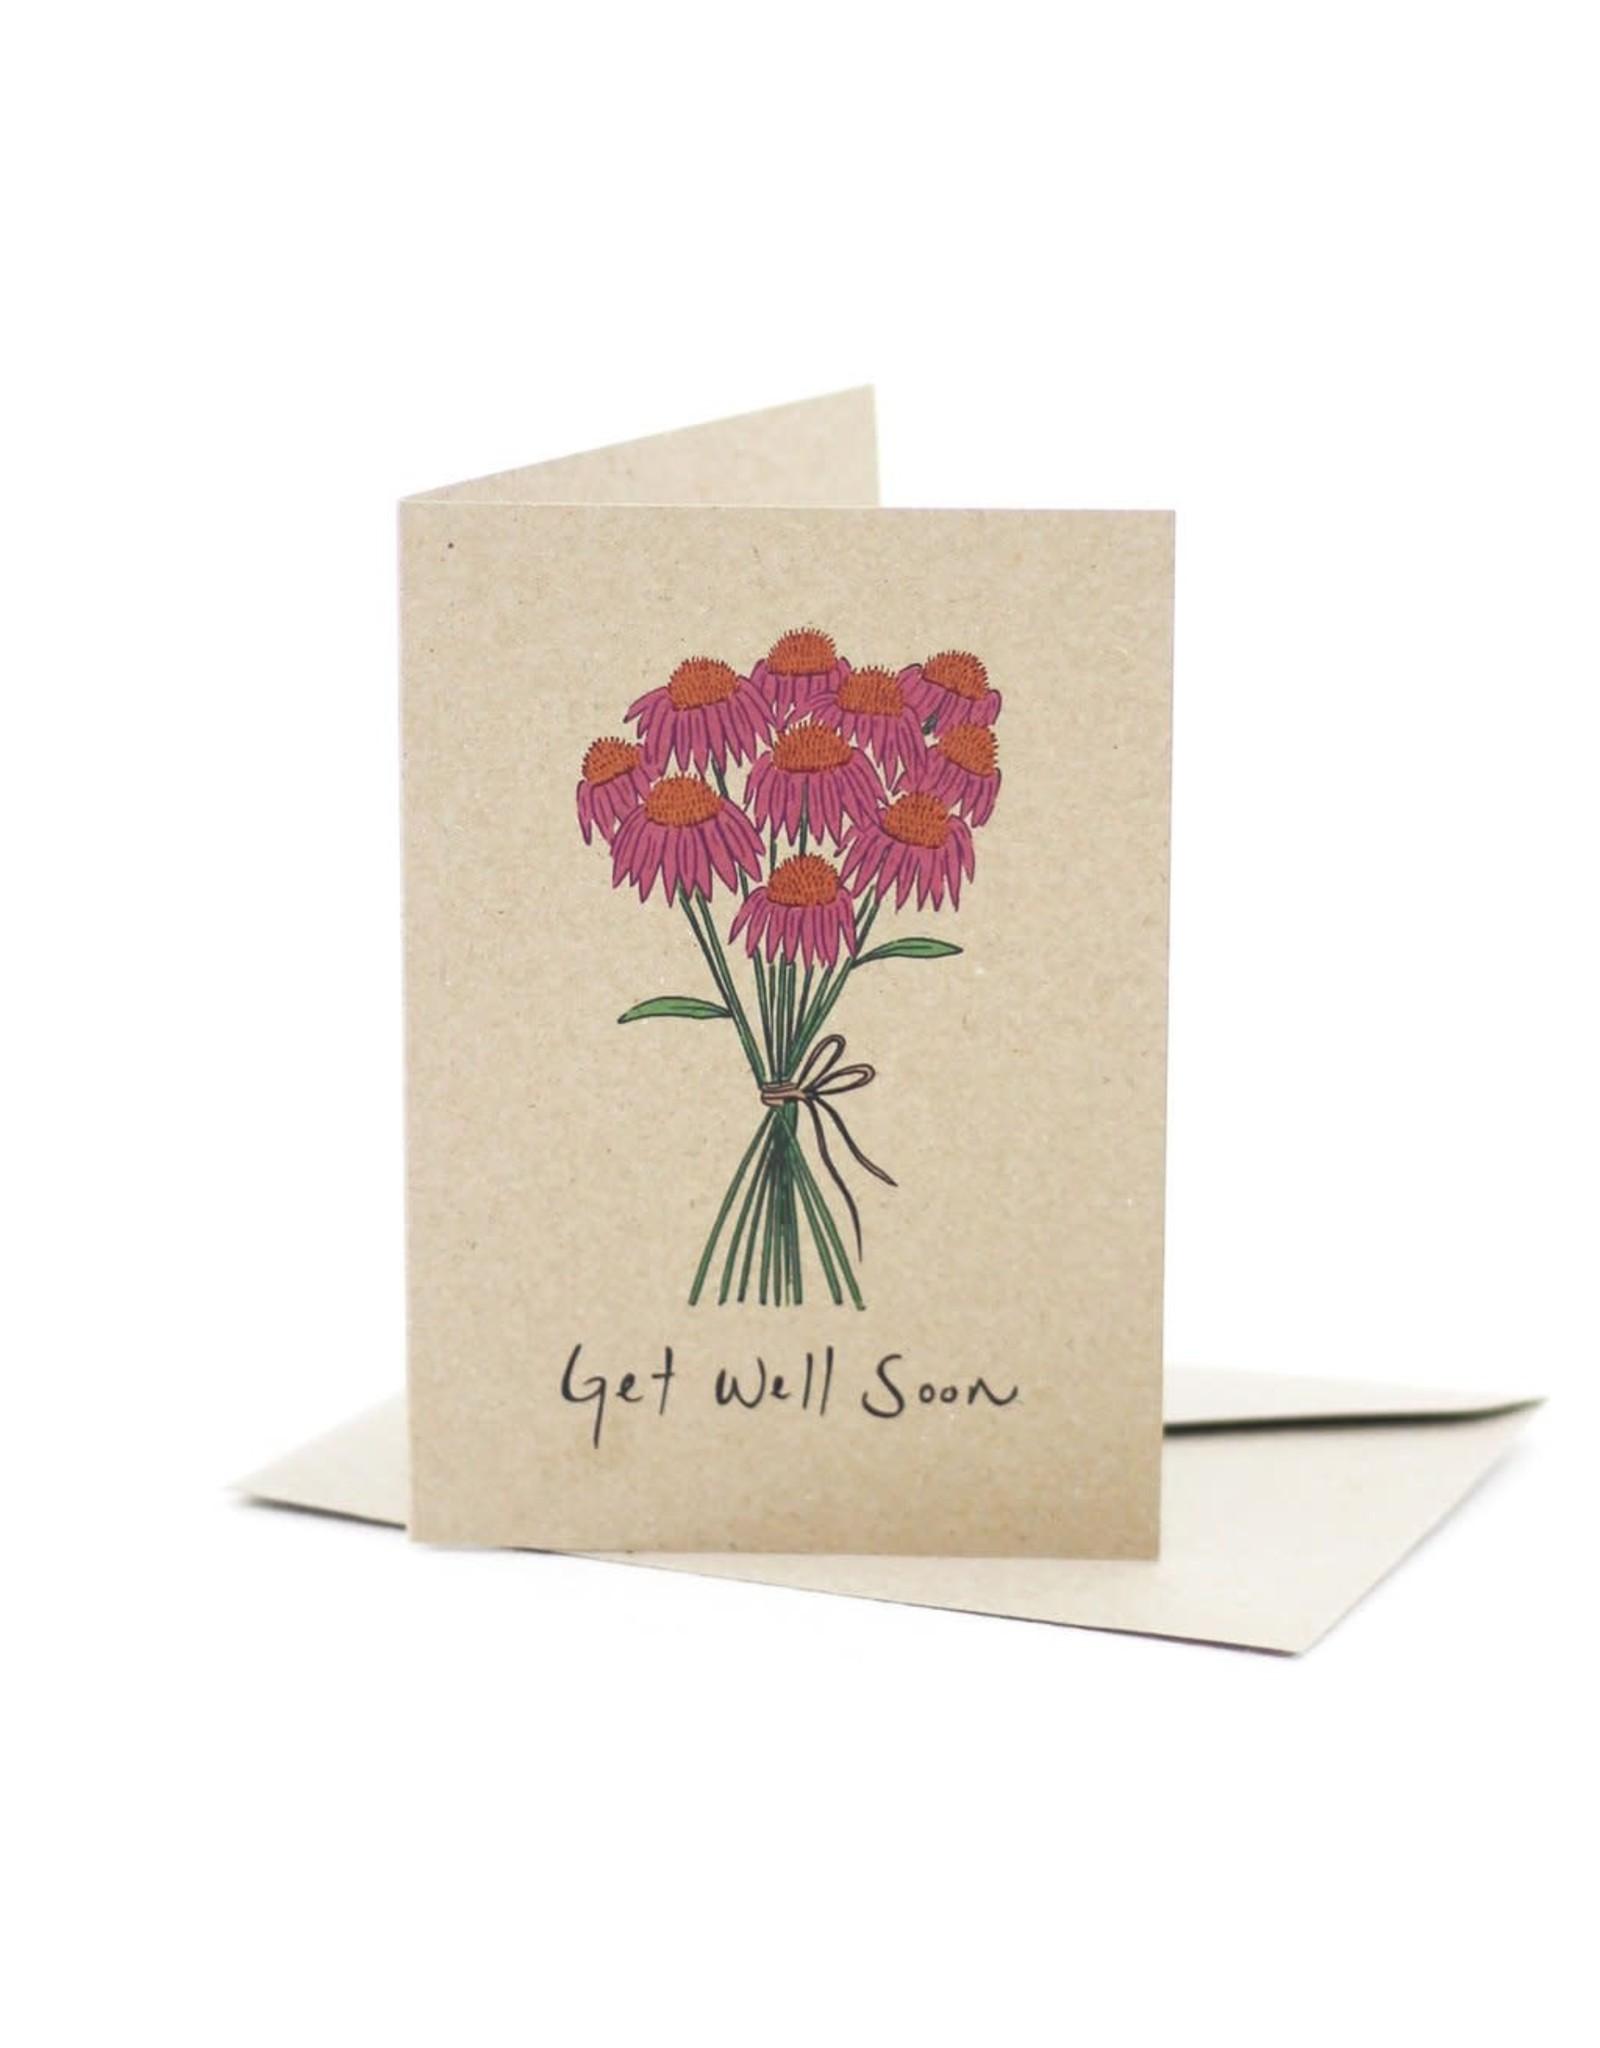 Deer Daisy Get Well Soon Greeting Card